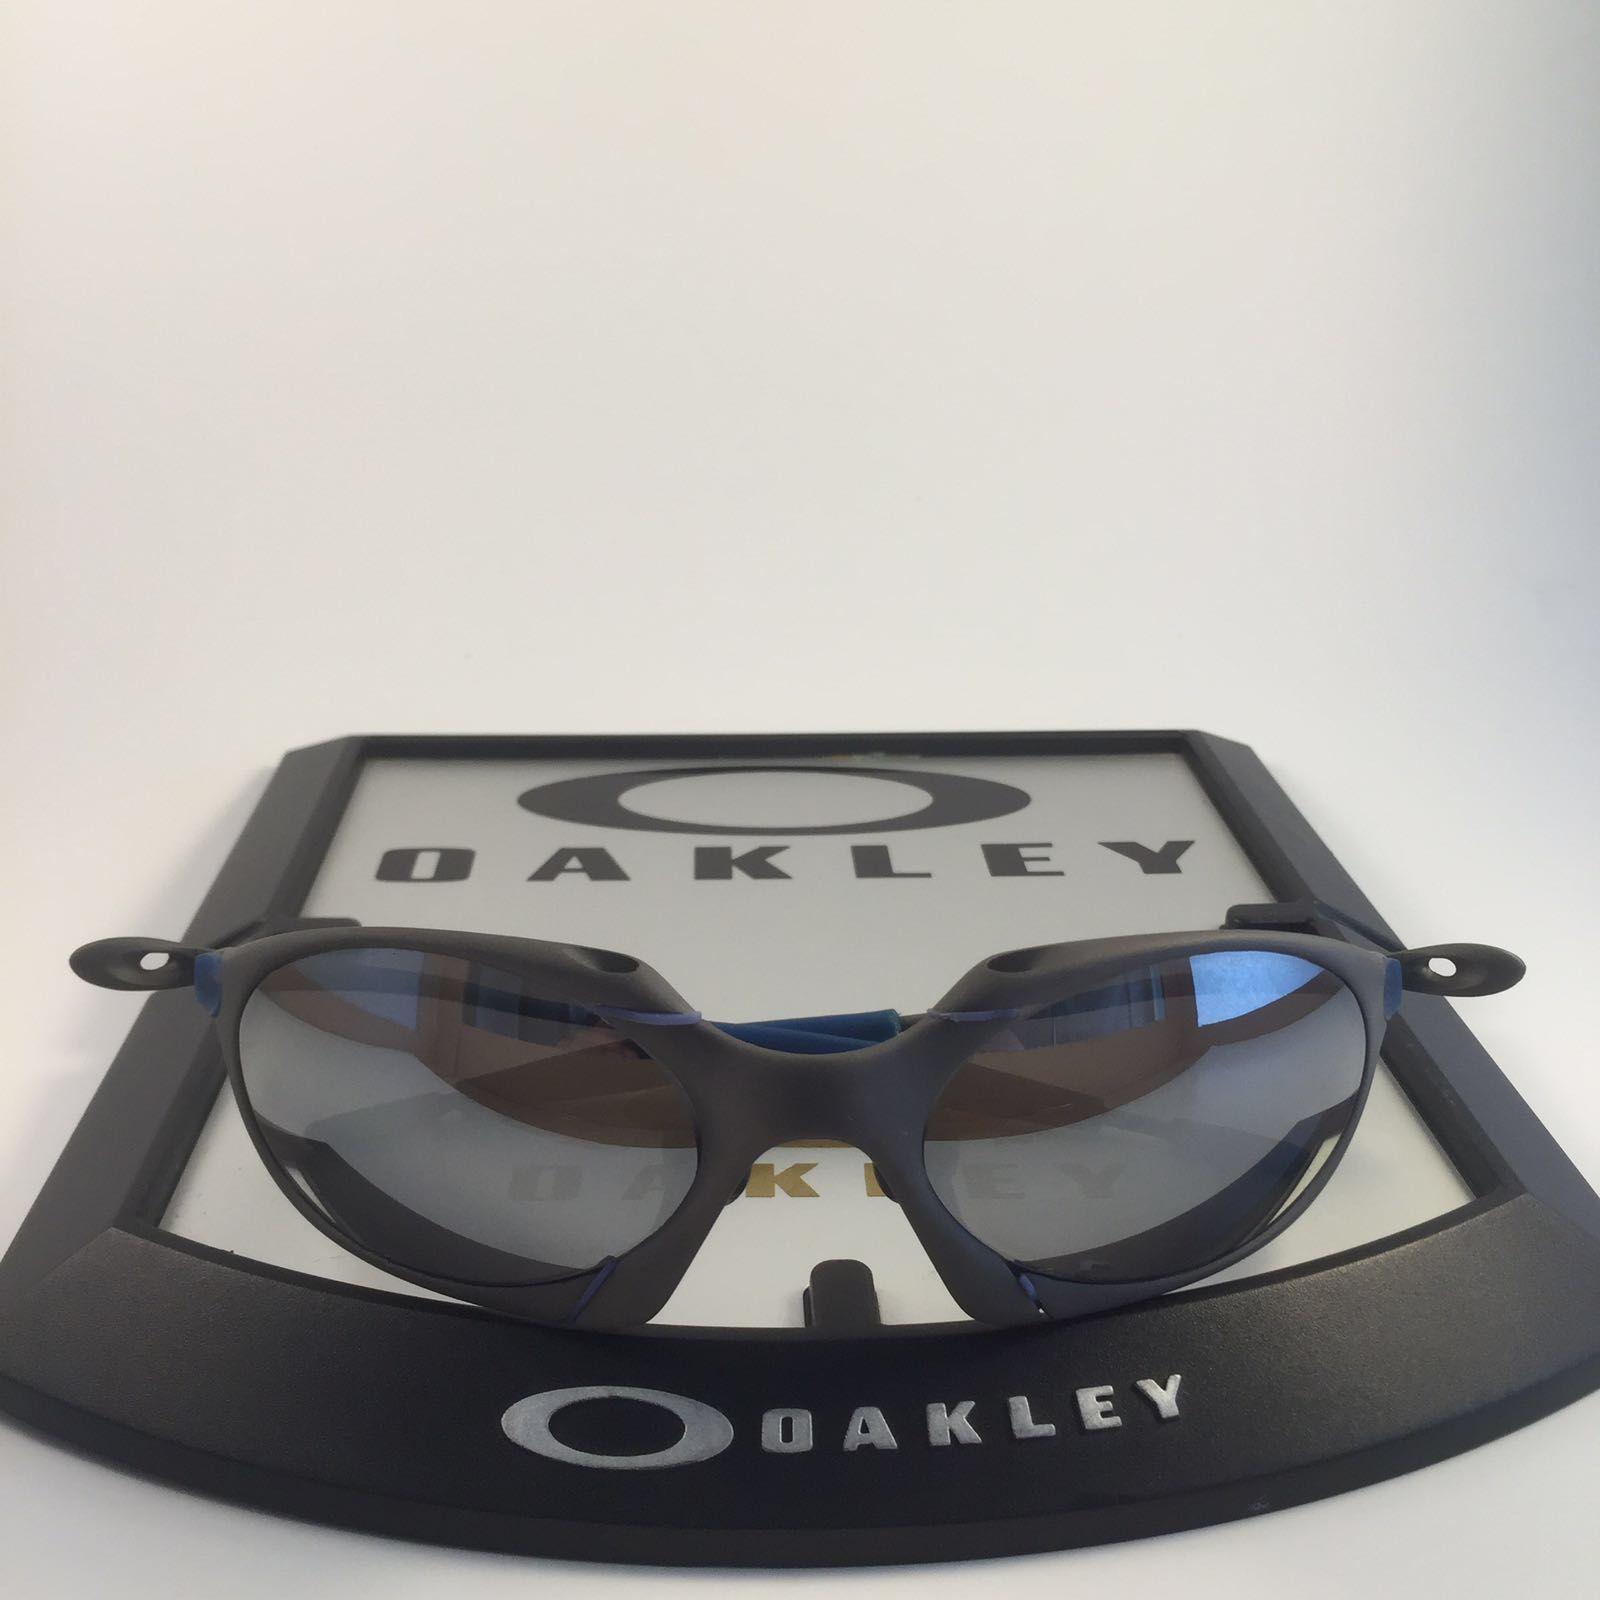 oakley romeo 1 x metal - e1c8080f-4e23-4779-b97d-a595530b4461.jpeg